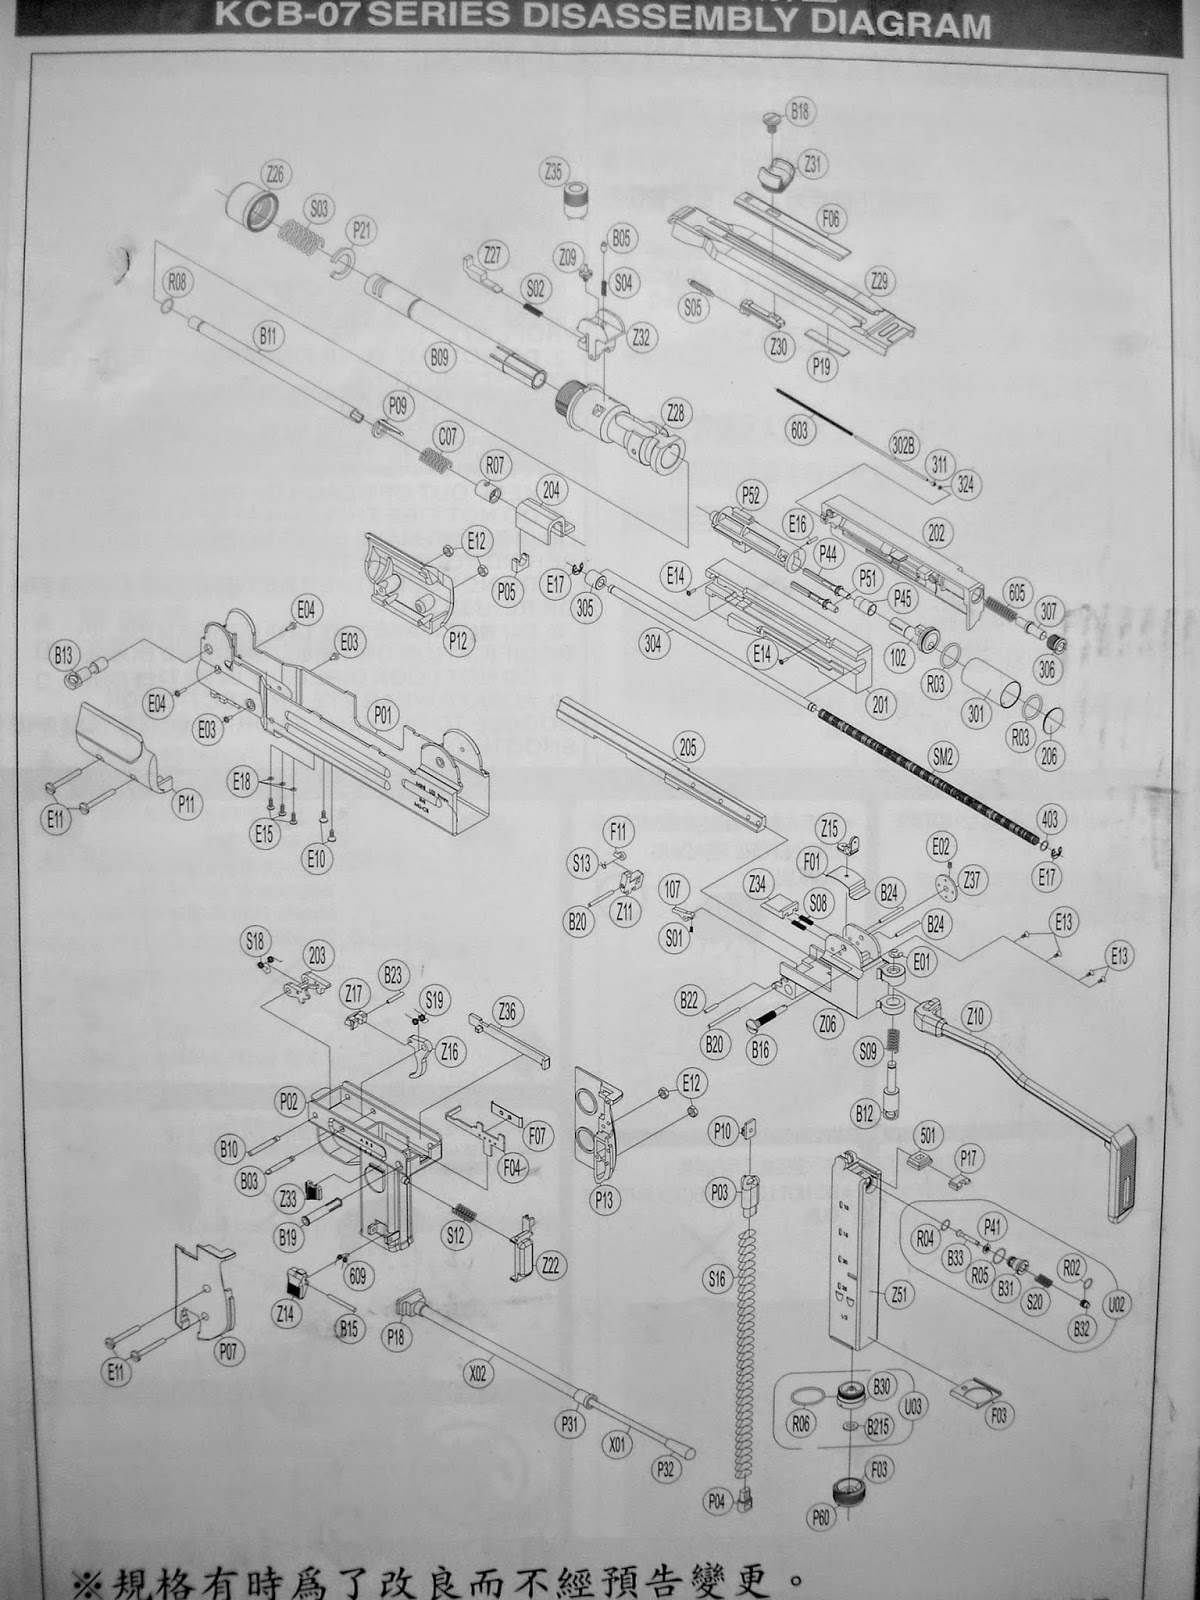 uzi diagram wiring diagramdisassembly diy my airsoft gun and other things kwc mini [ 1200 x 1600 Pixel ]